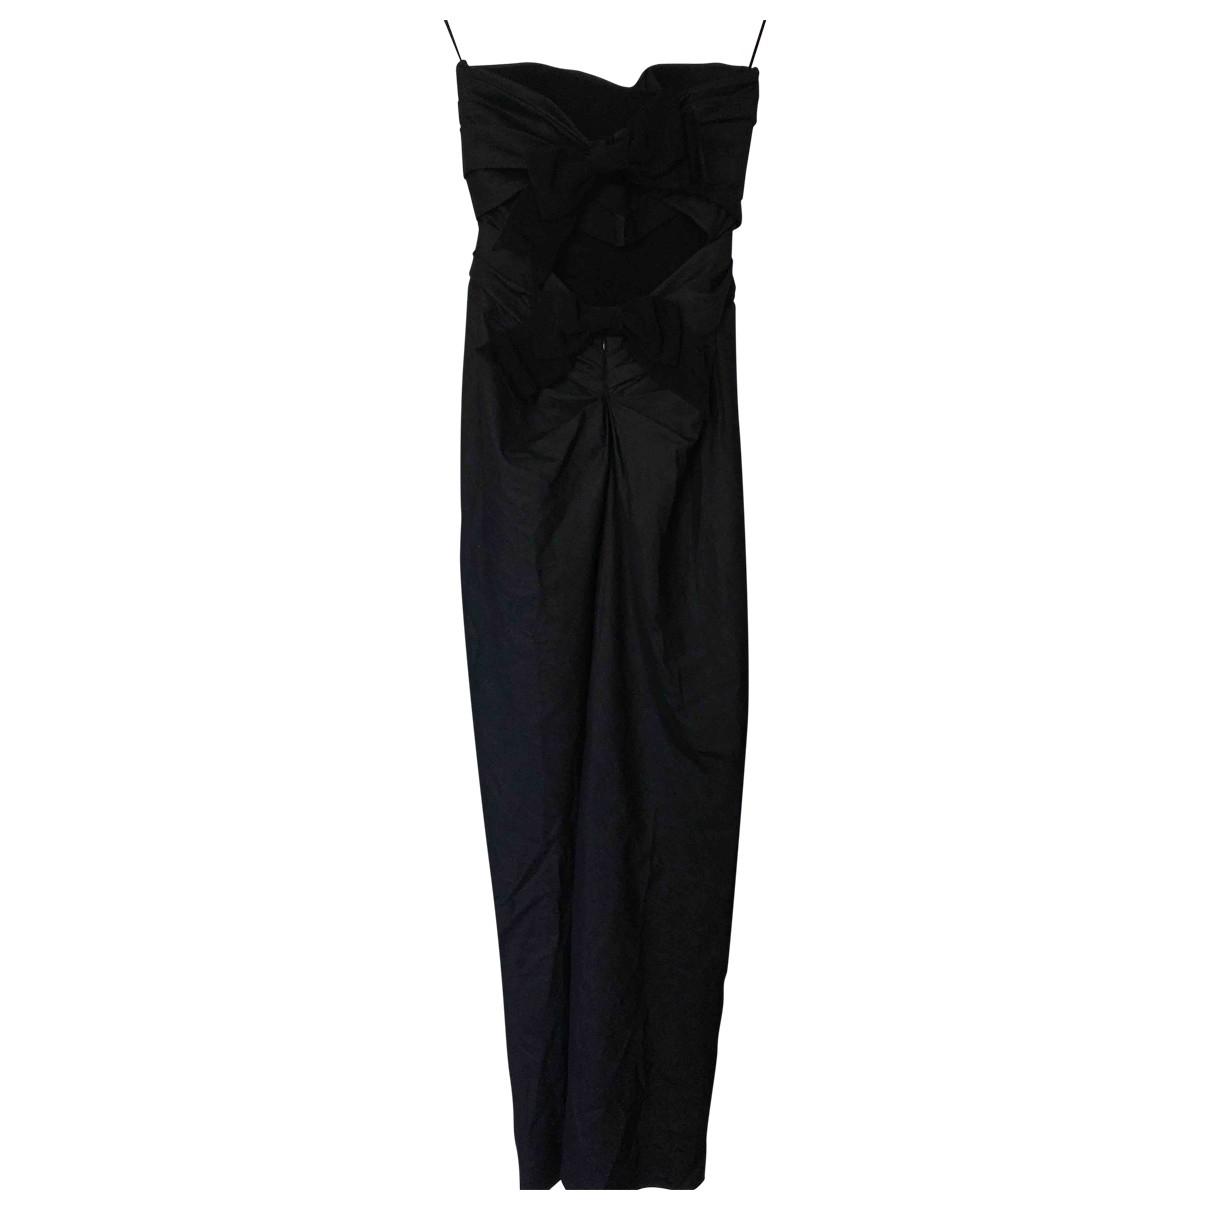 Moschino \N Blue Denim - Jeans dress for Women 40 IT